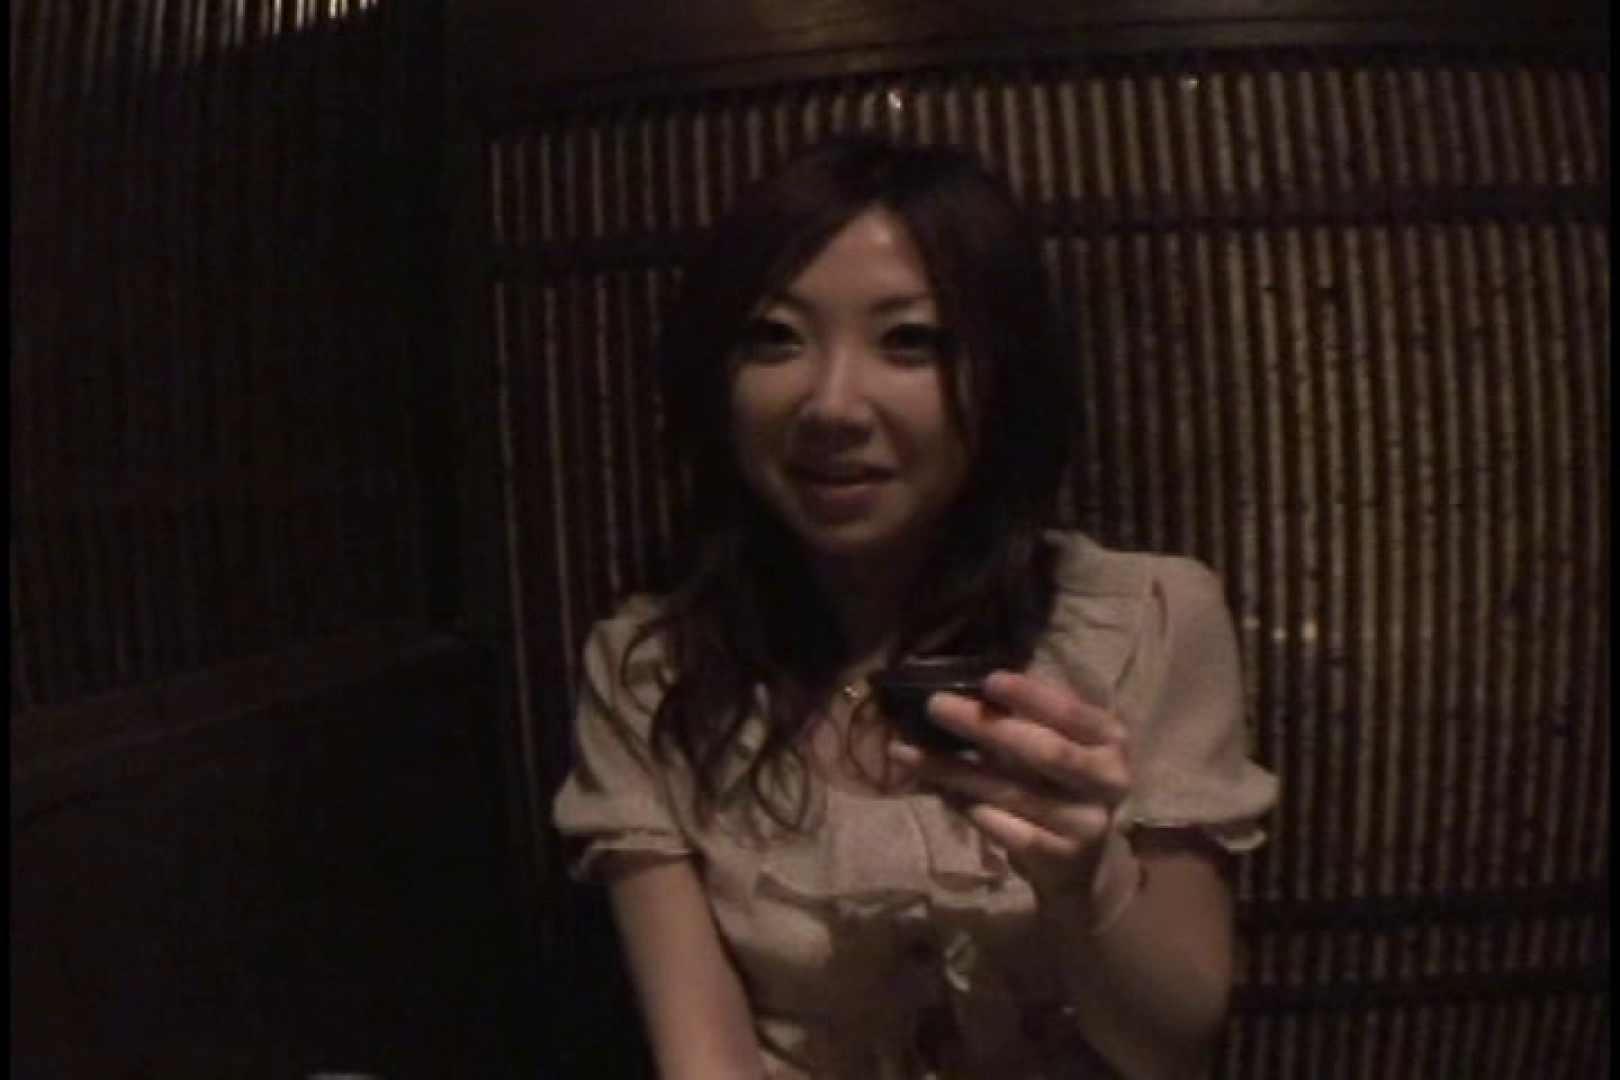 JDハンター全国ツアー vol.041 後編 女子大生のエロ動画   0  82PIX 1